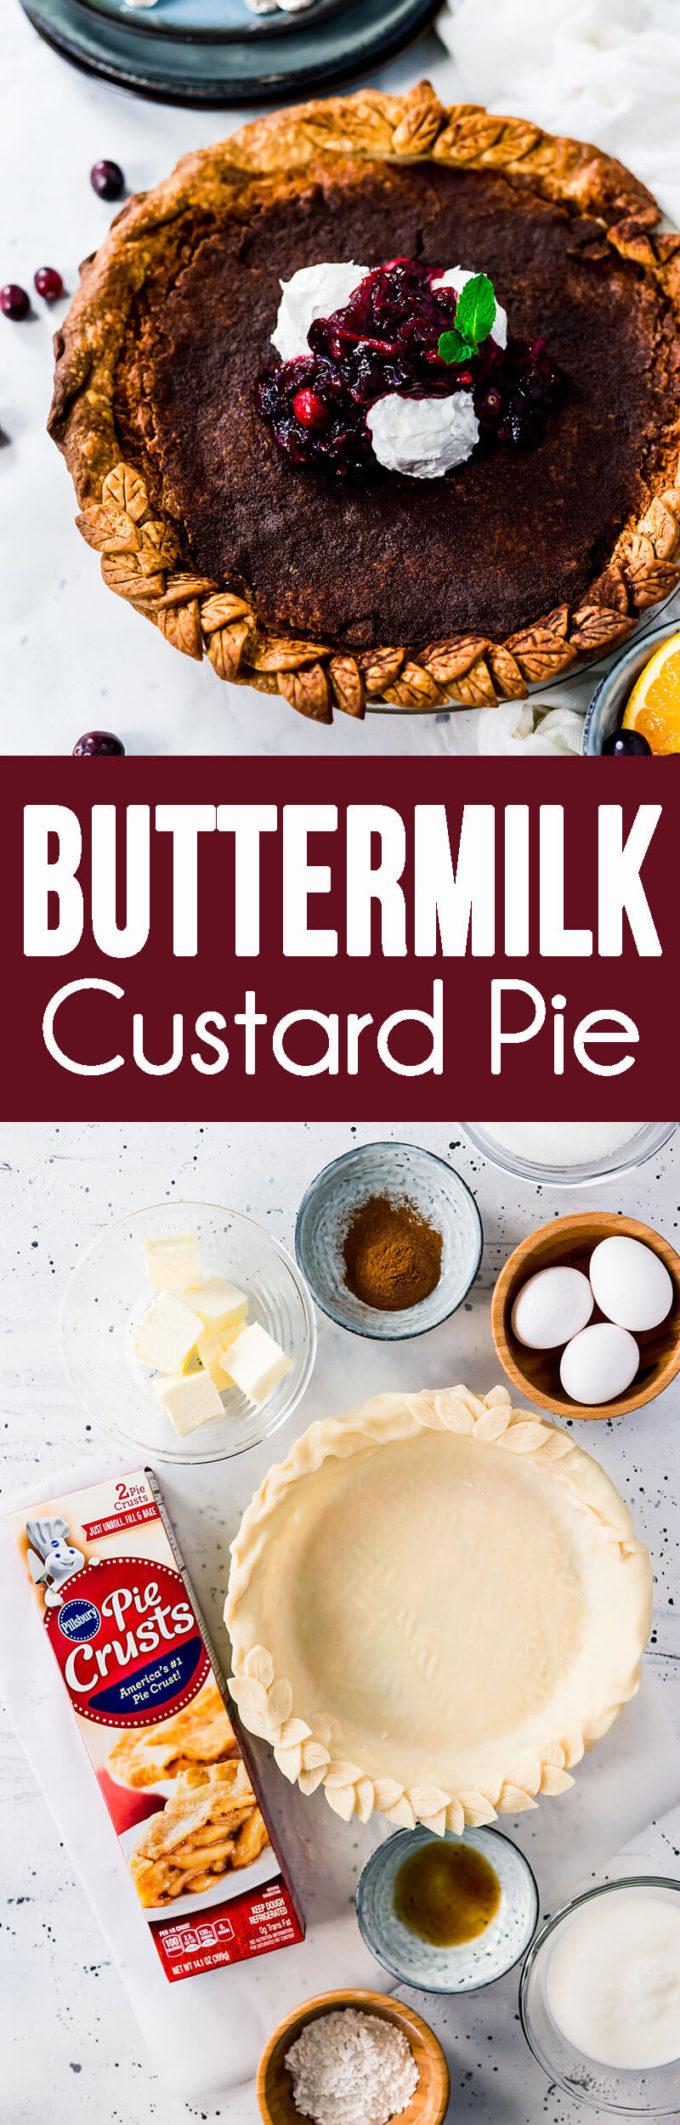 Buttermilk Pie a family classic and favorite custard pie or vinegar pie